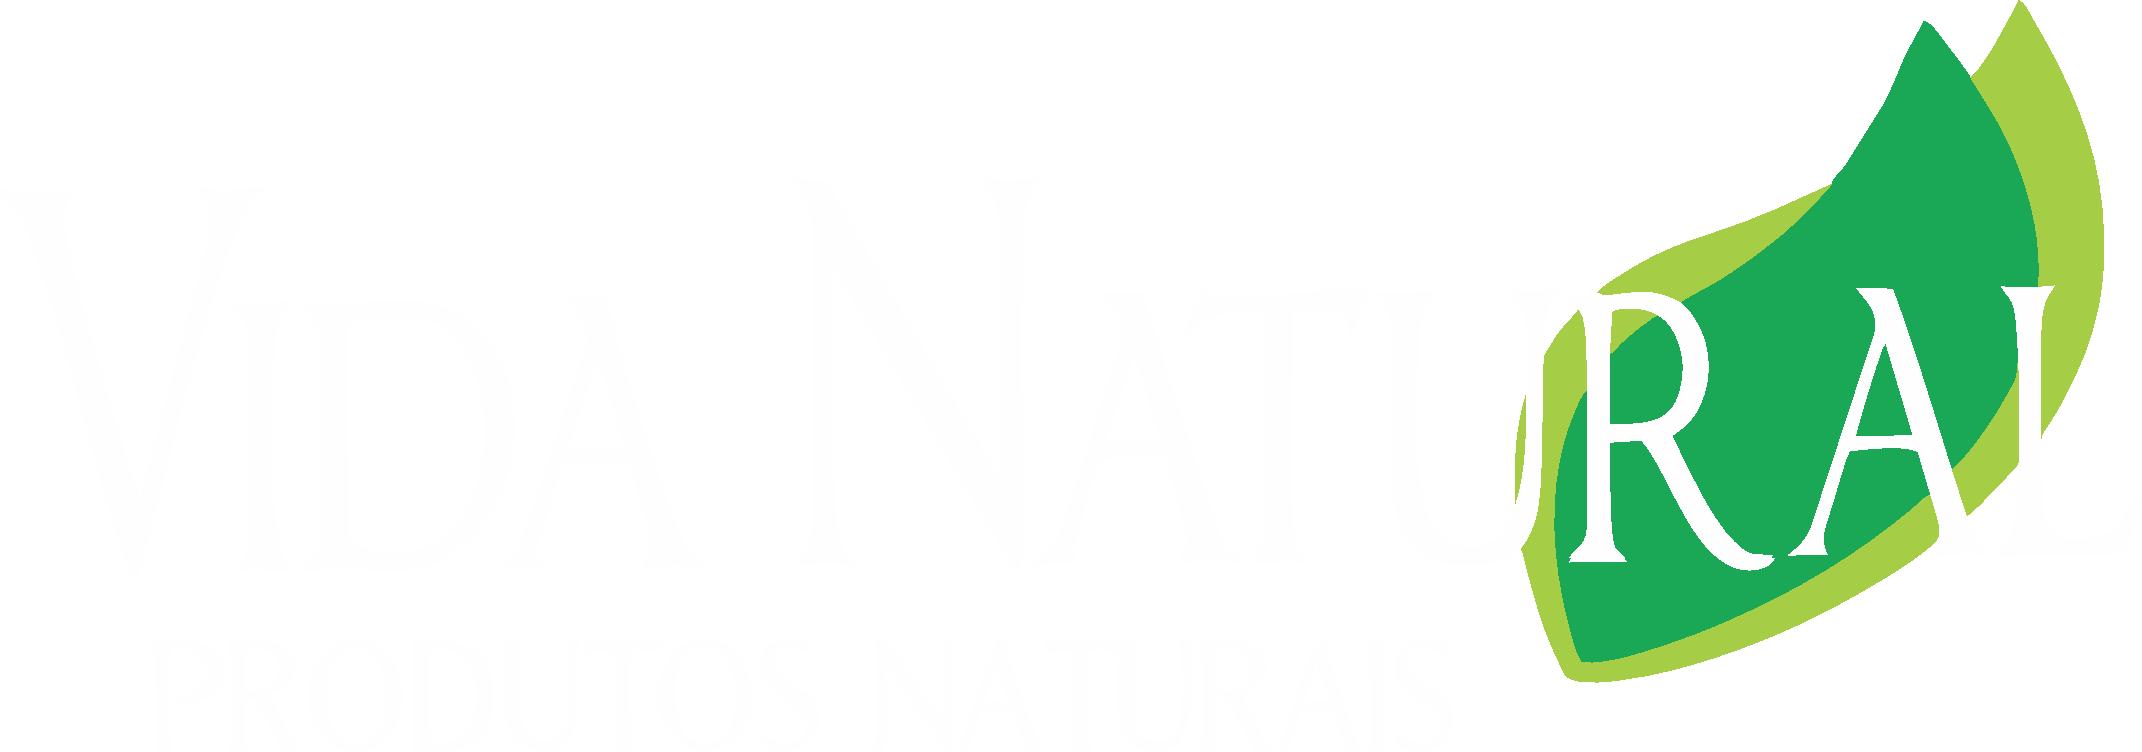 vida natural produtos naturais